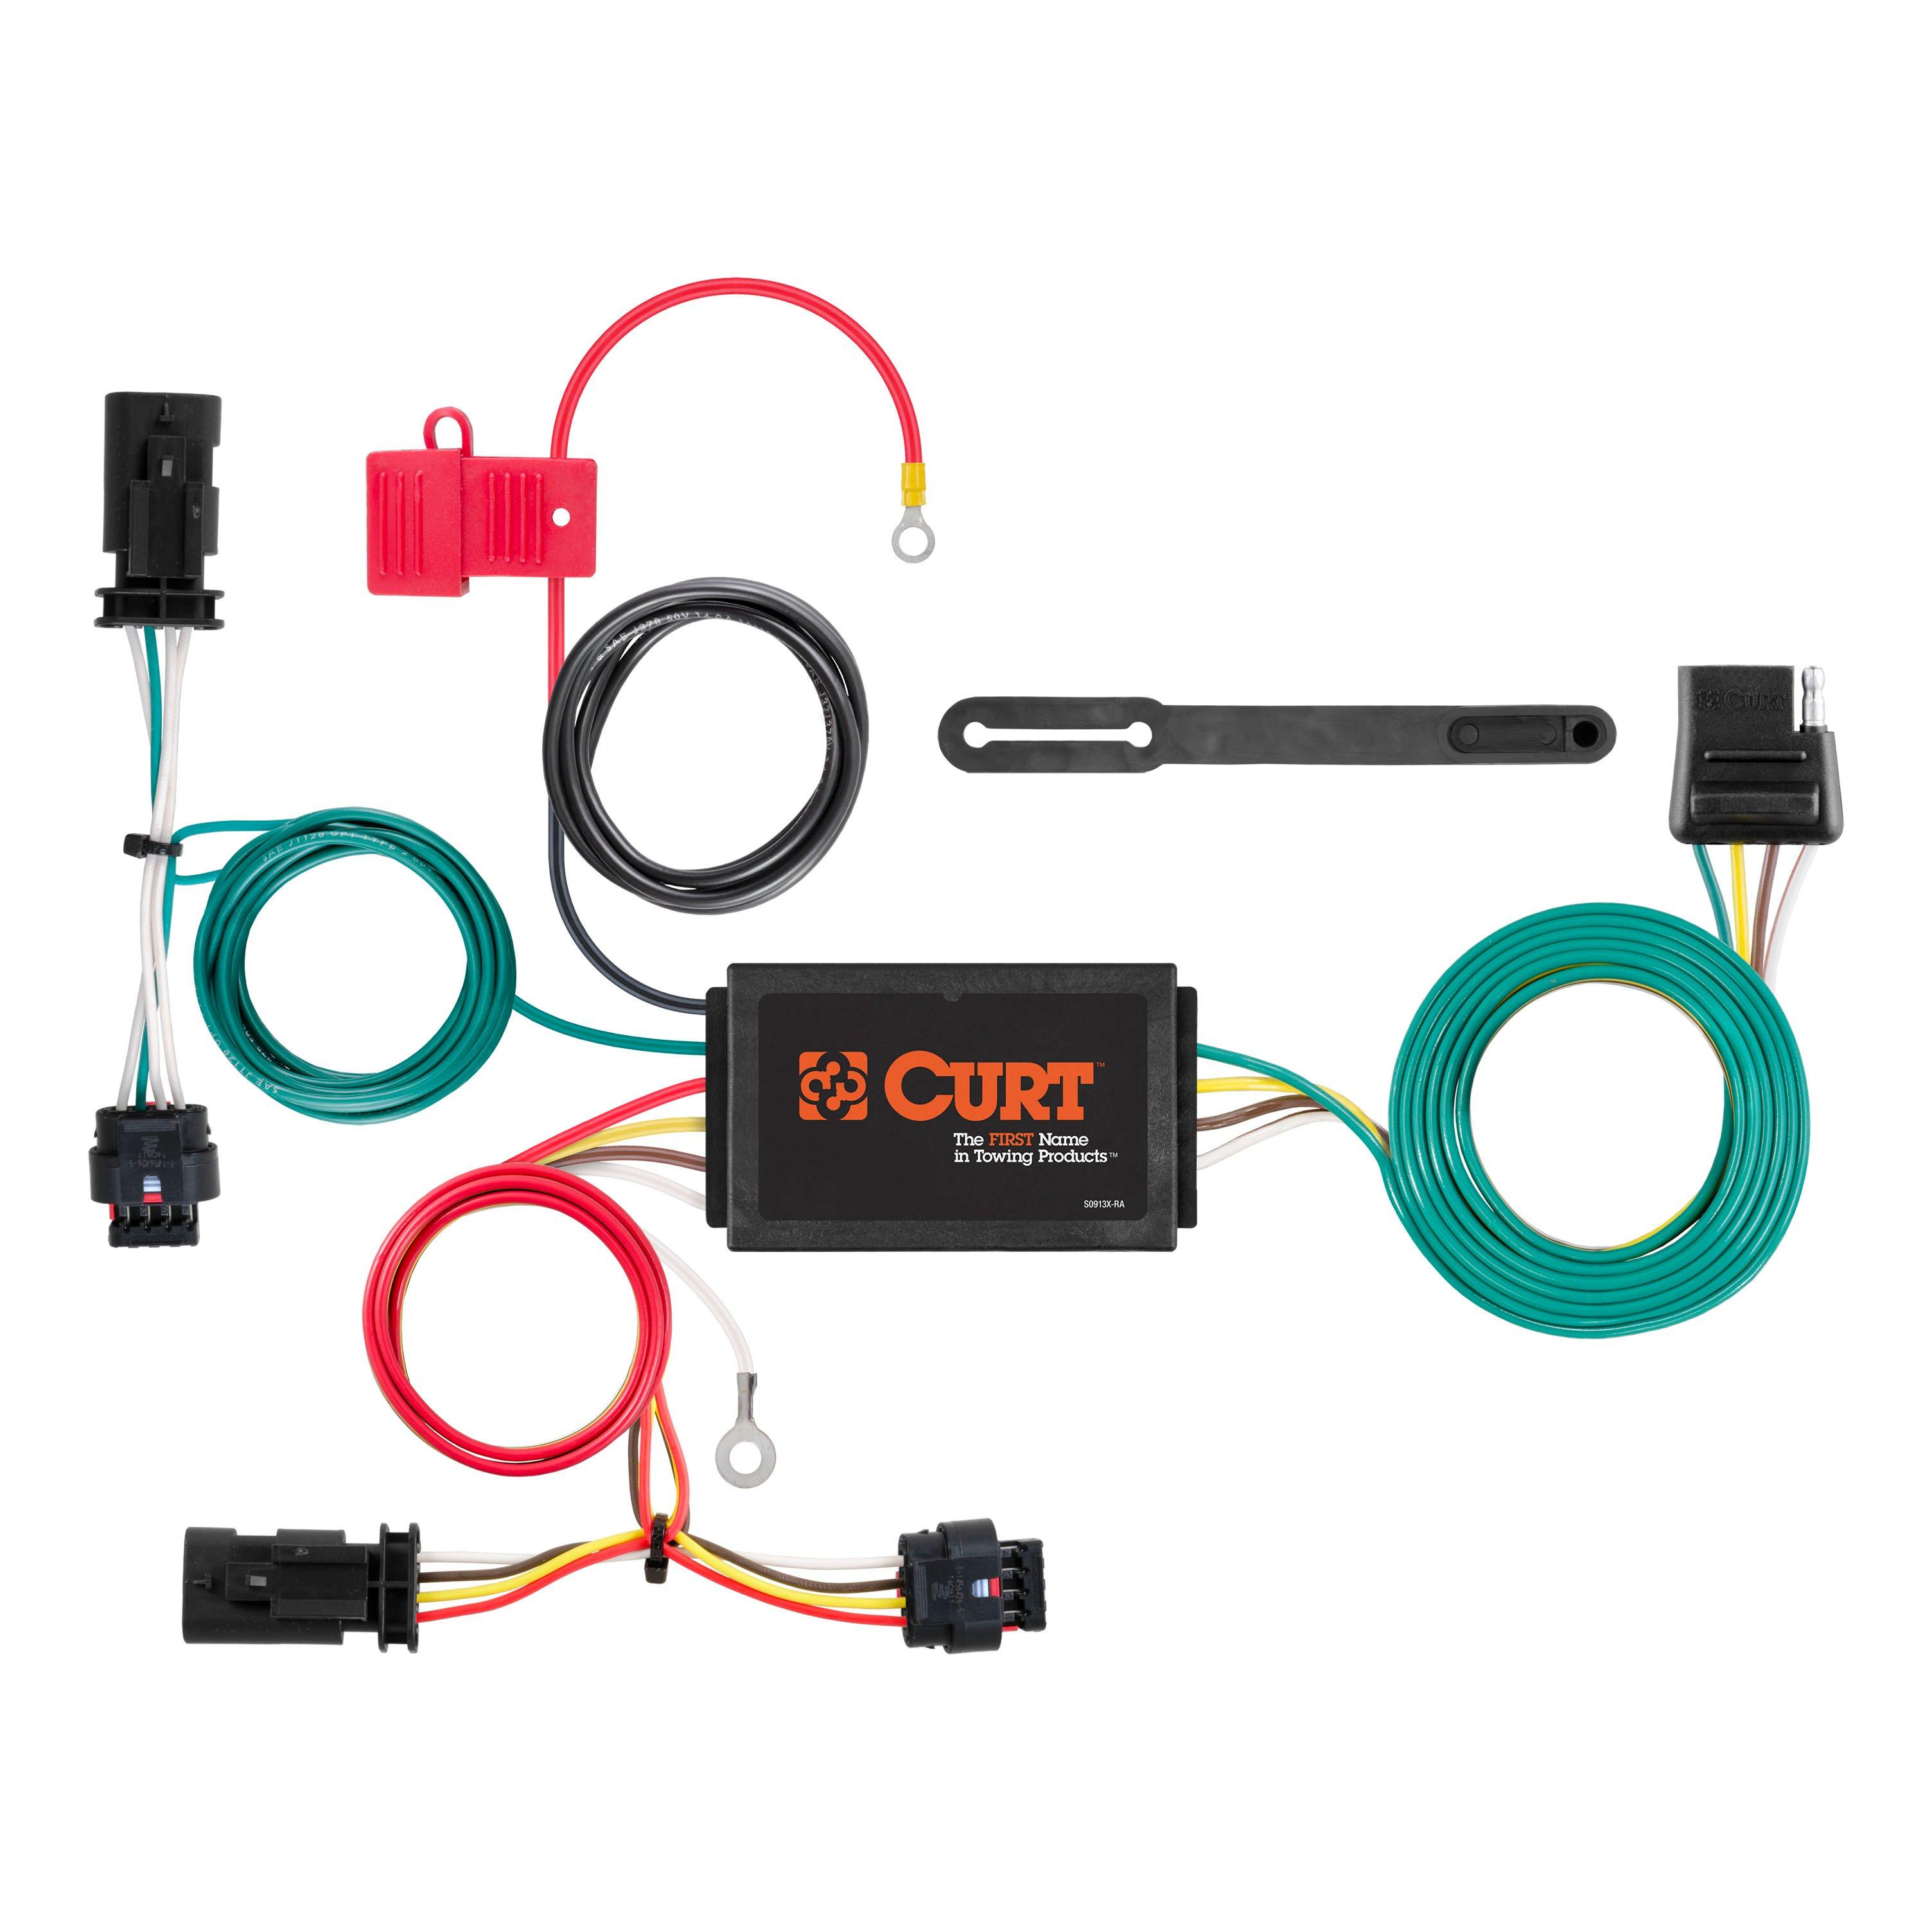 56354_3008x1990_a curt custom wiring harness 56360 curt hitch wiring harness Curt 7 Pin Wiring Harness at soozxer.org